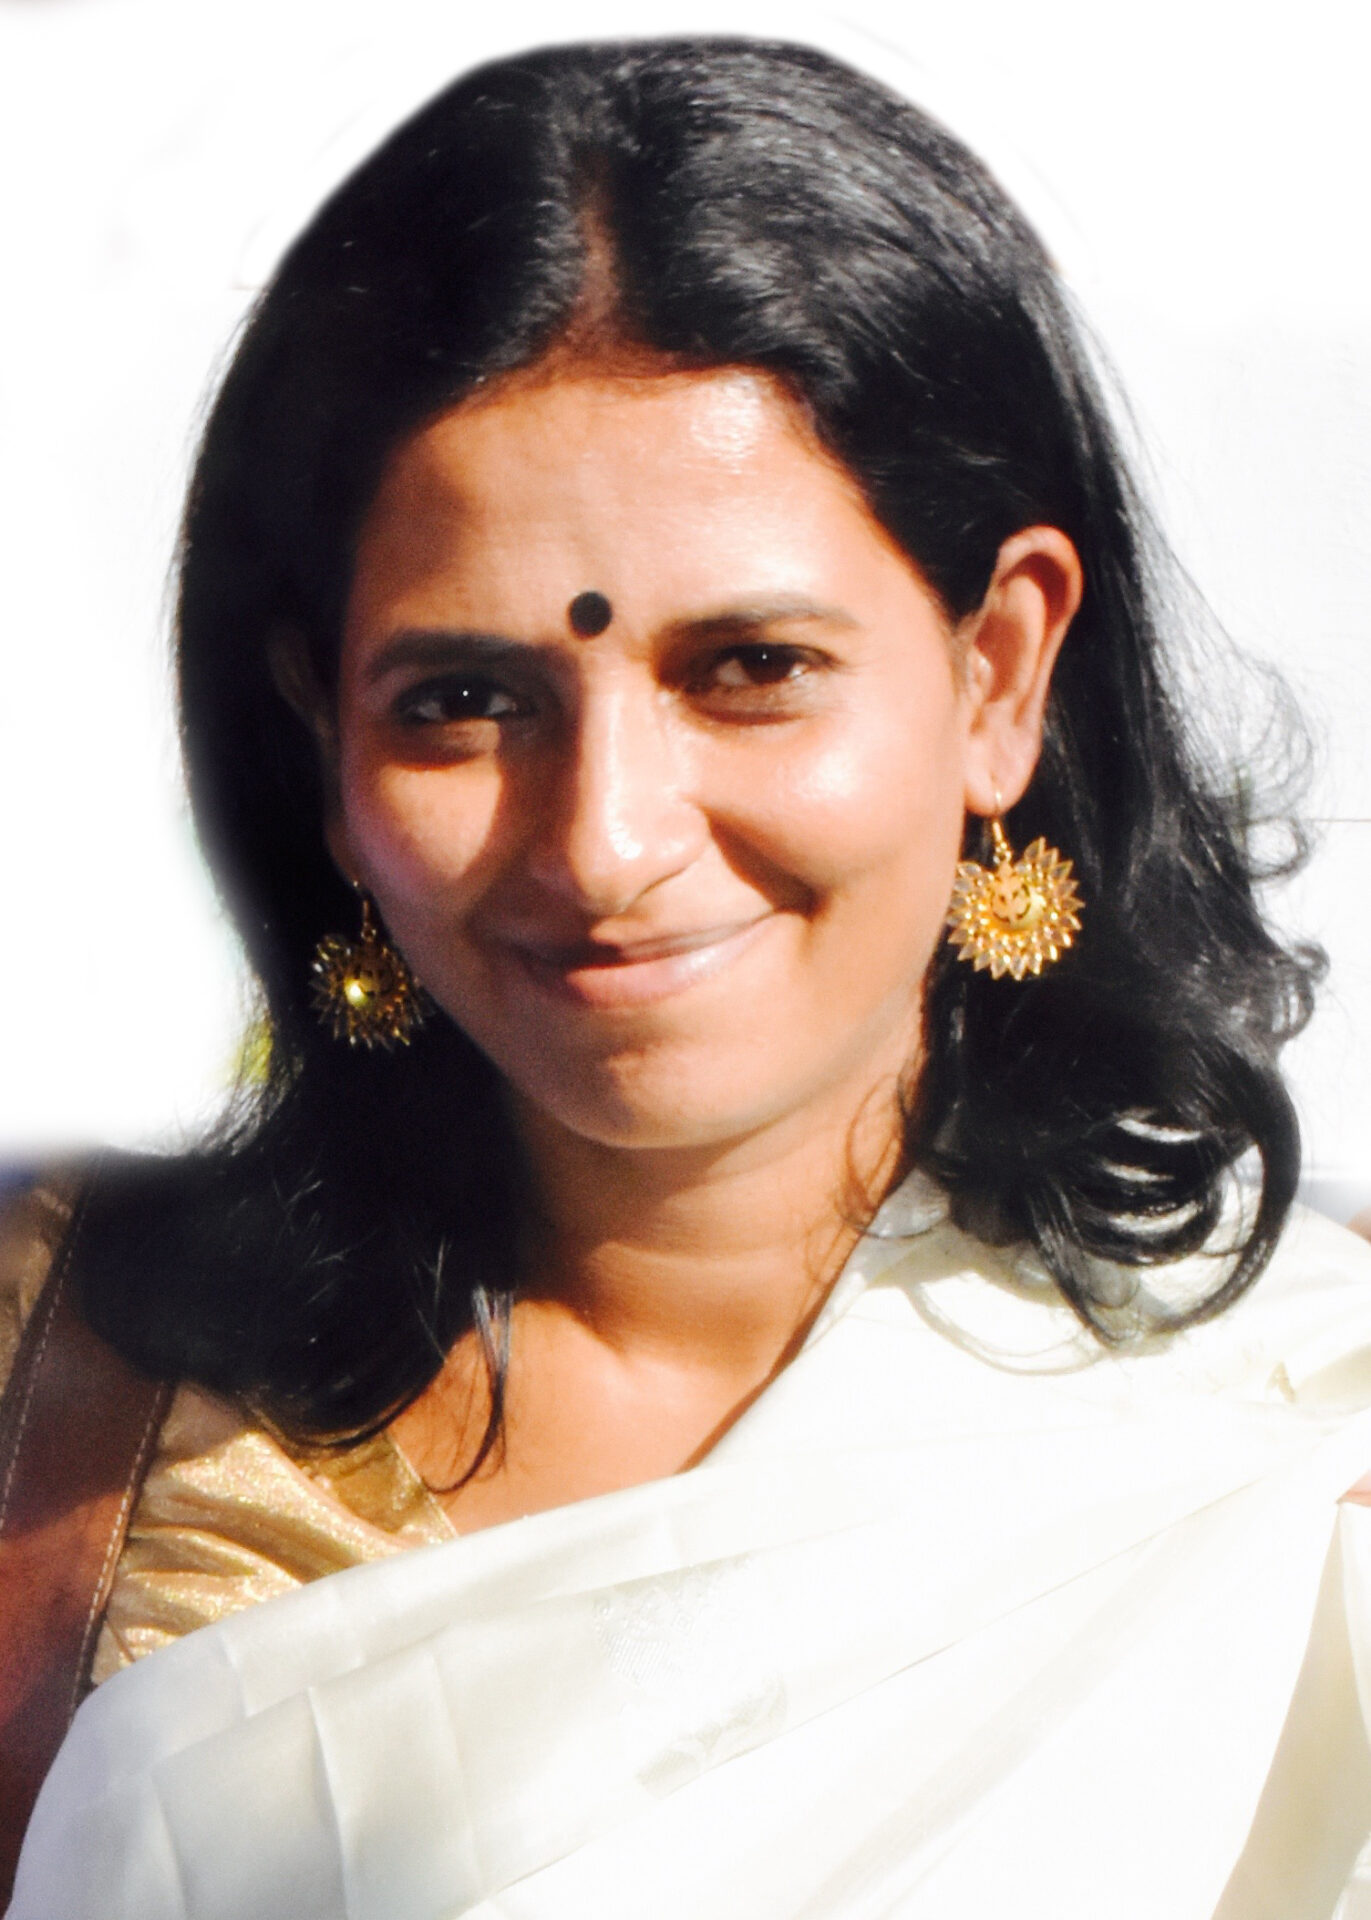 Dr. Shubha Nagesh